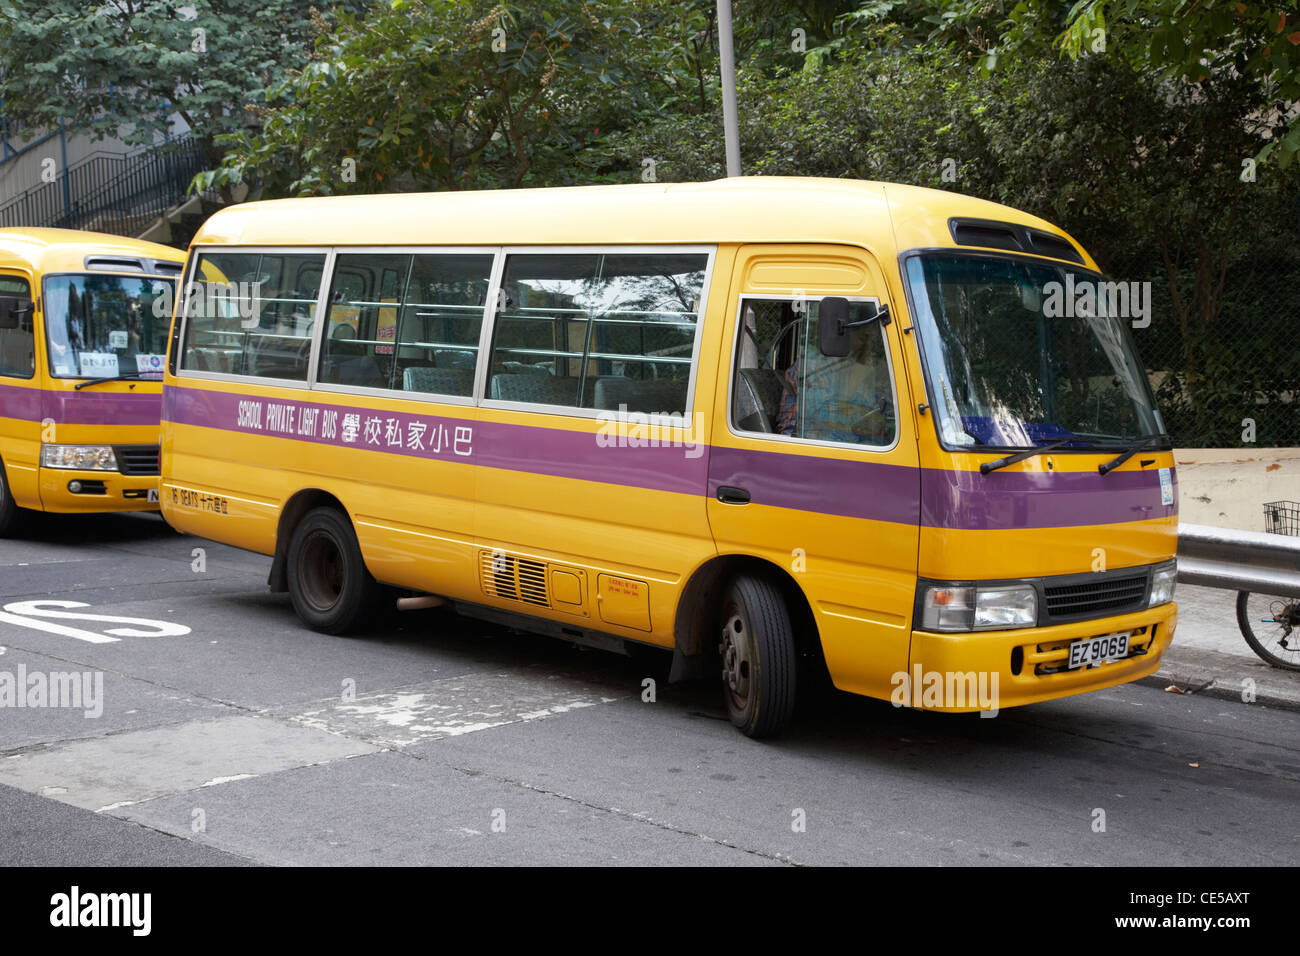 school private light bus minibus schoolbus hong kong hksar china asia - Stock Image